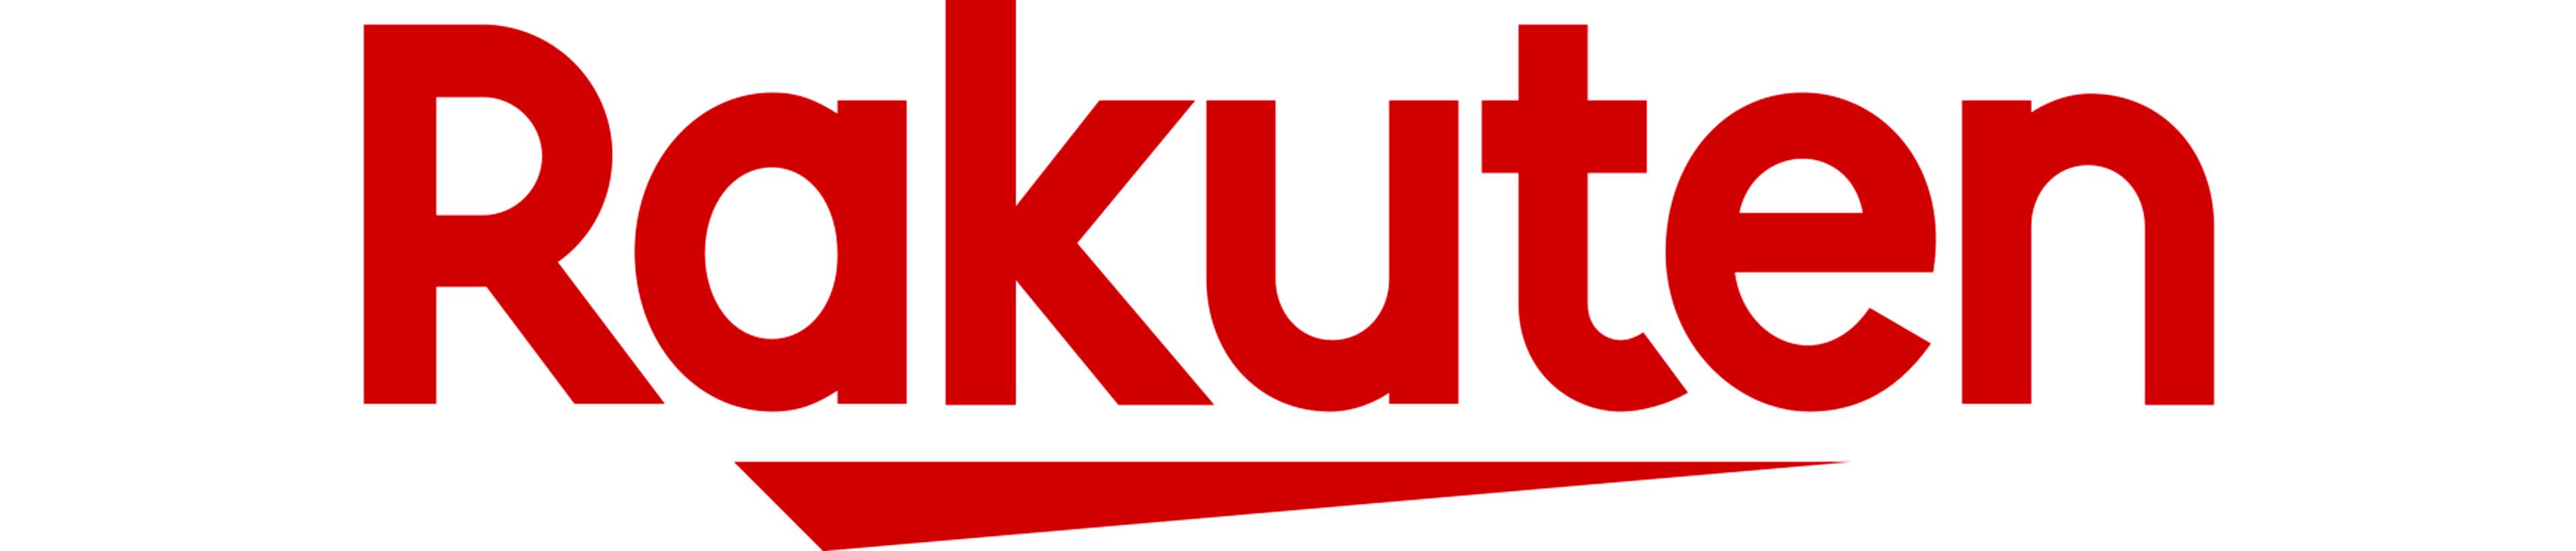 rakuten-logo-final